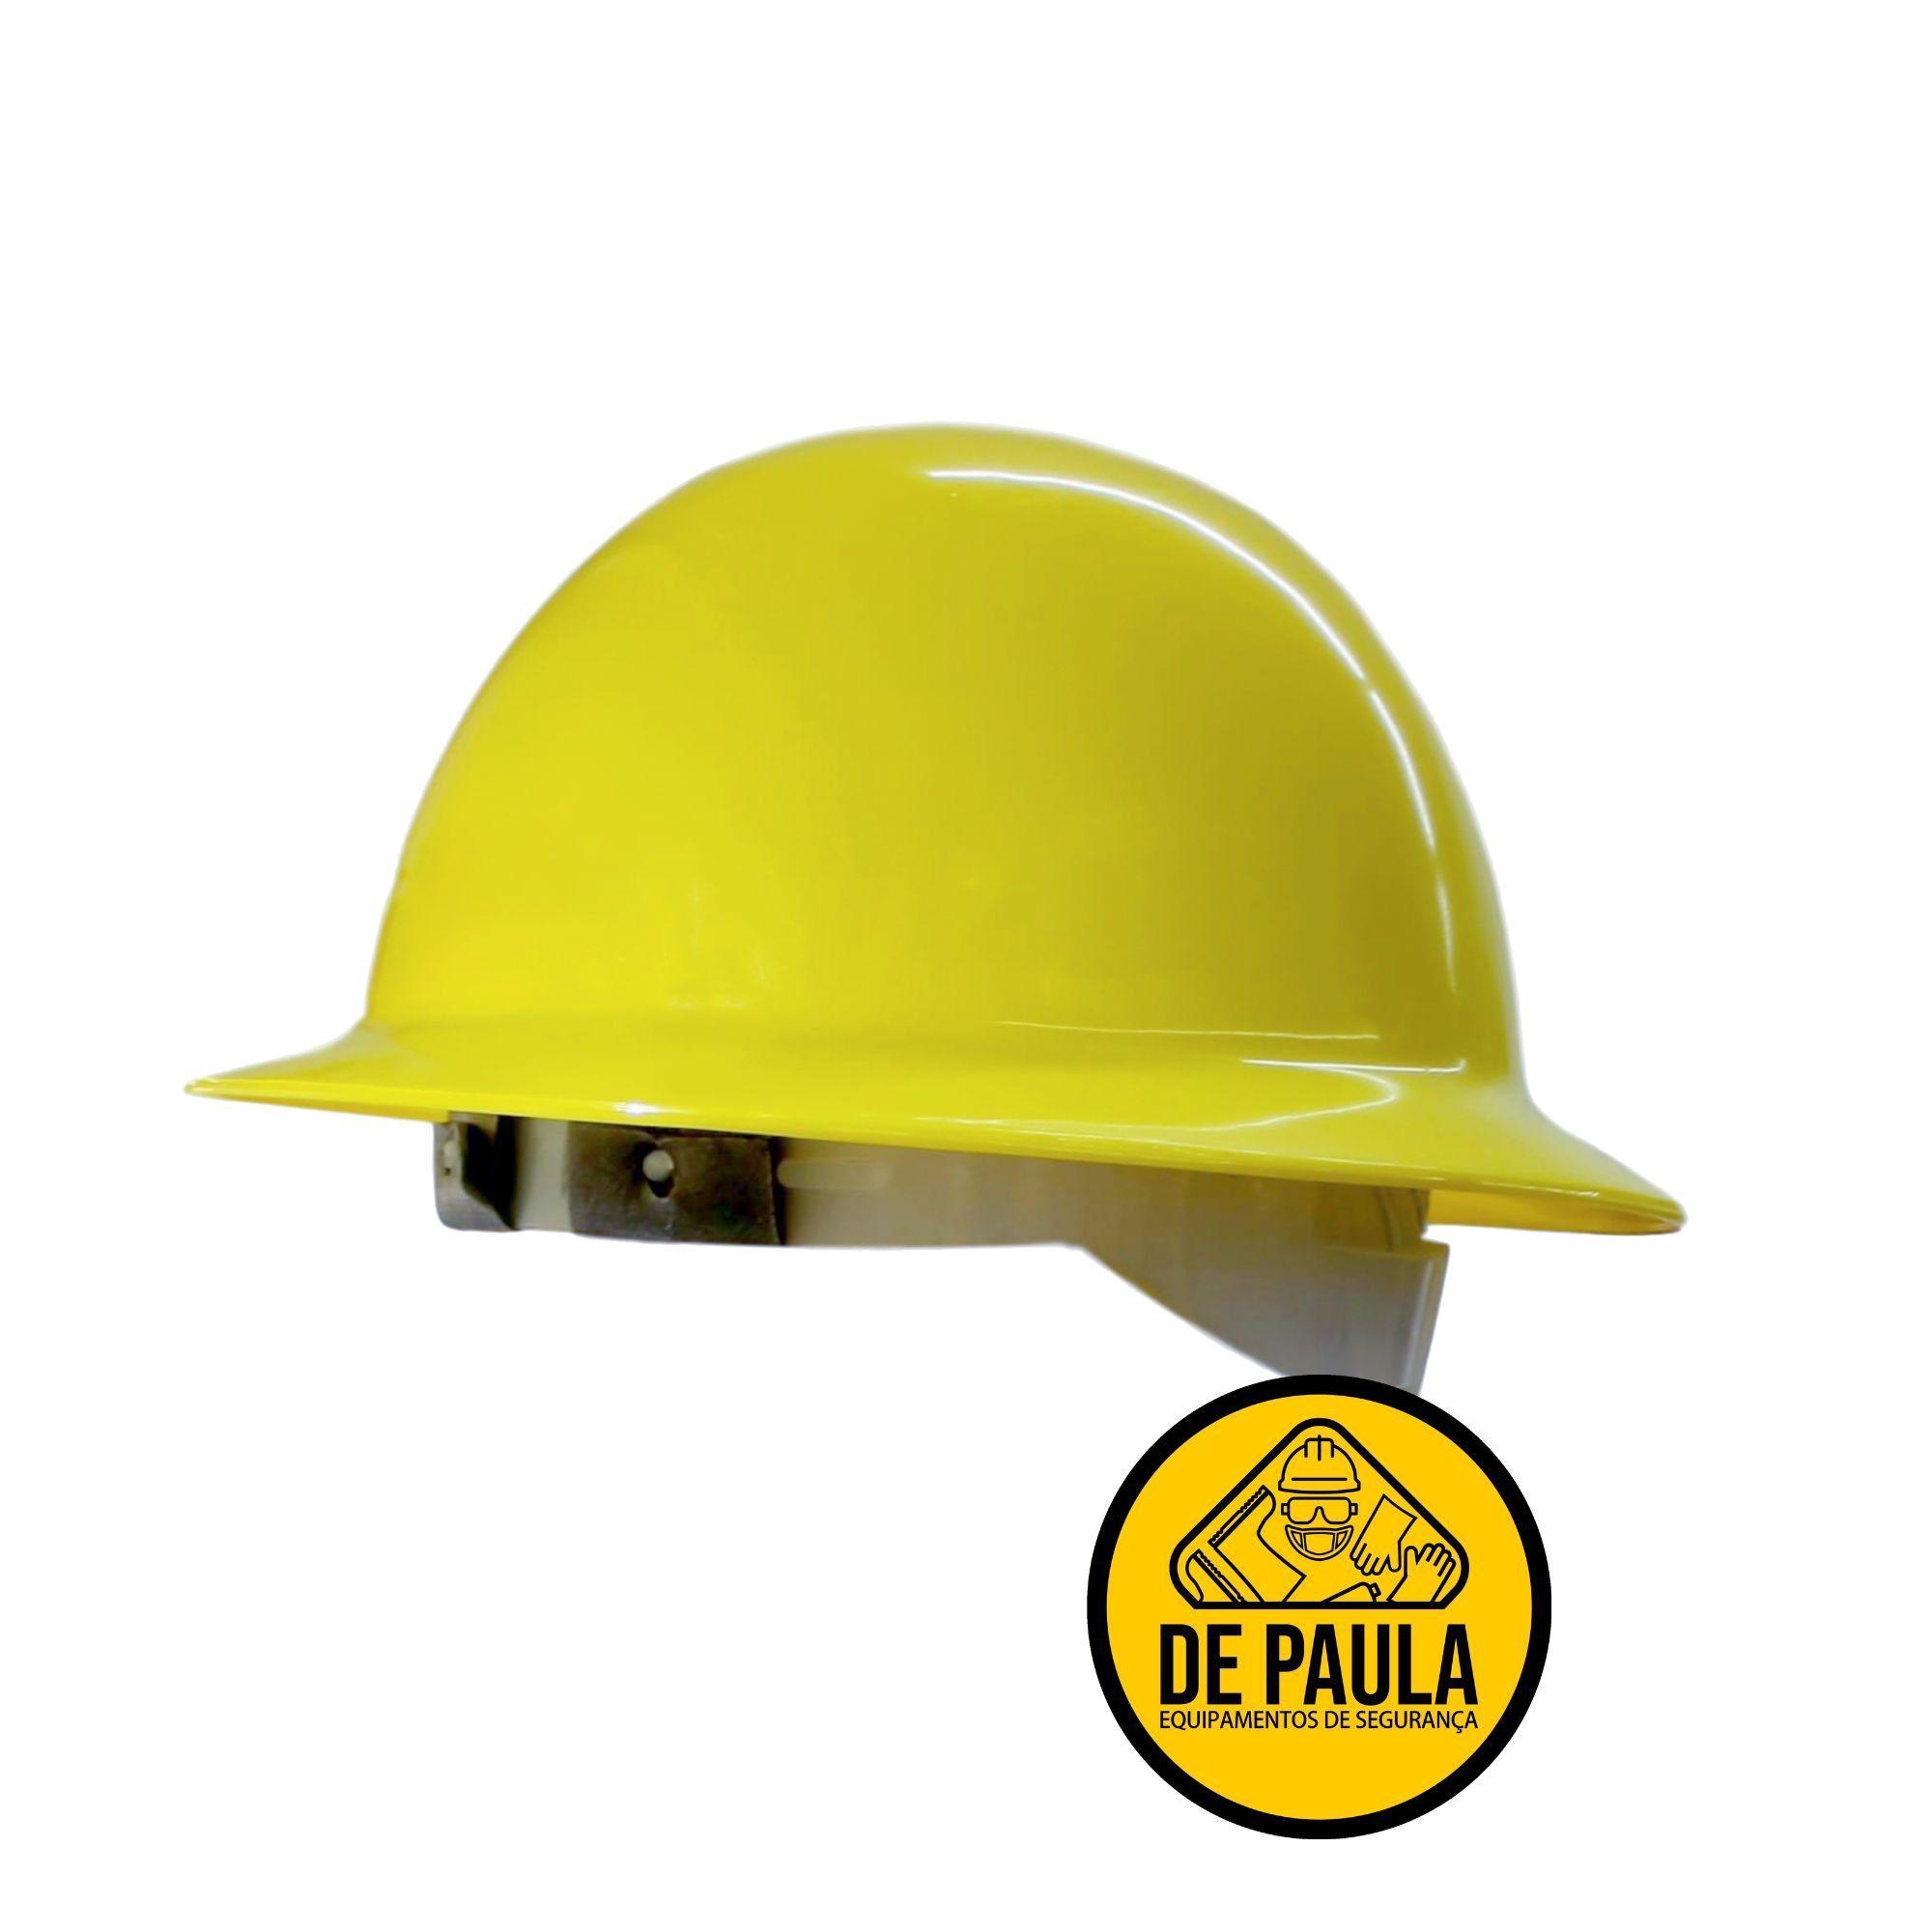 Capacete Aba Total Classe B Eletricista Várias Cores -  C.A. 25883  - DE PAULA EPI